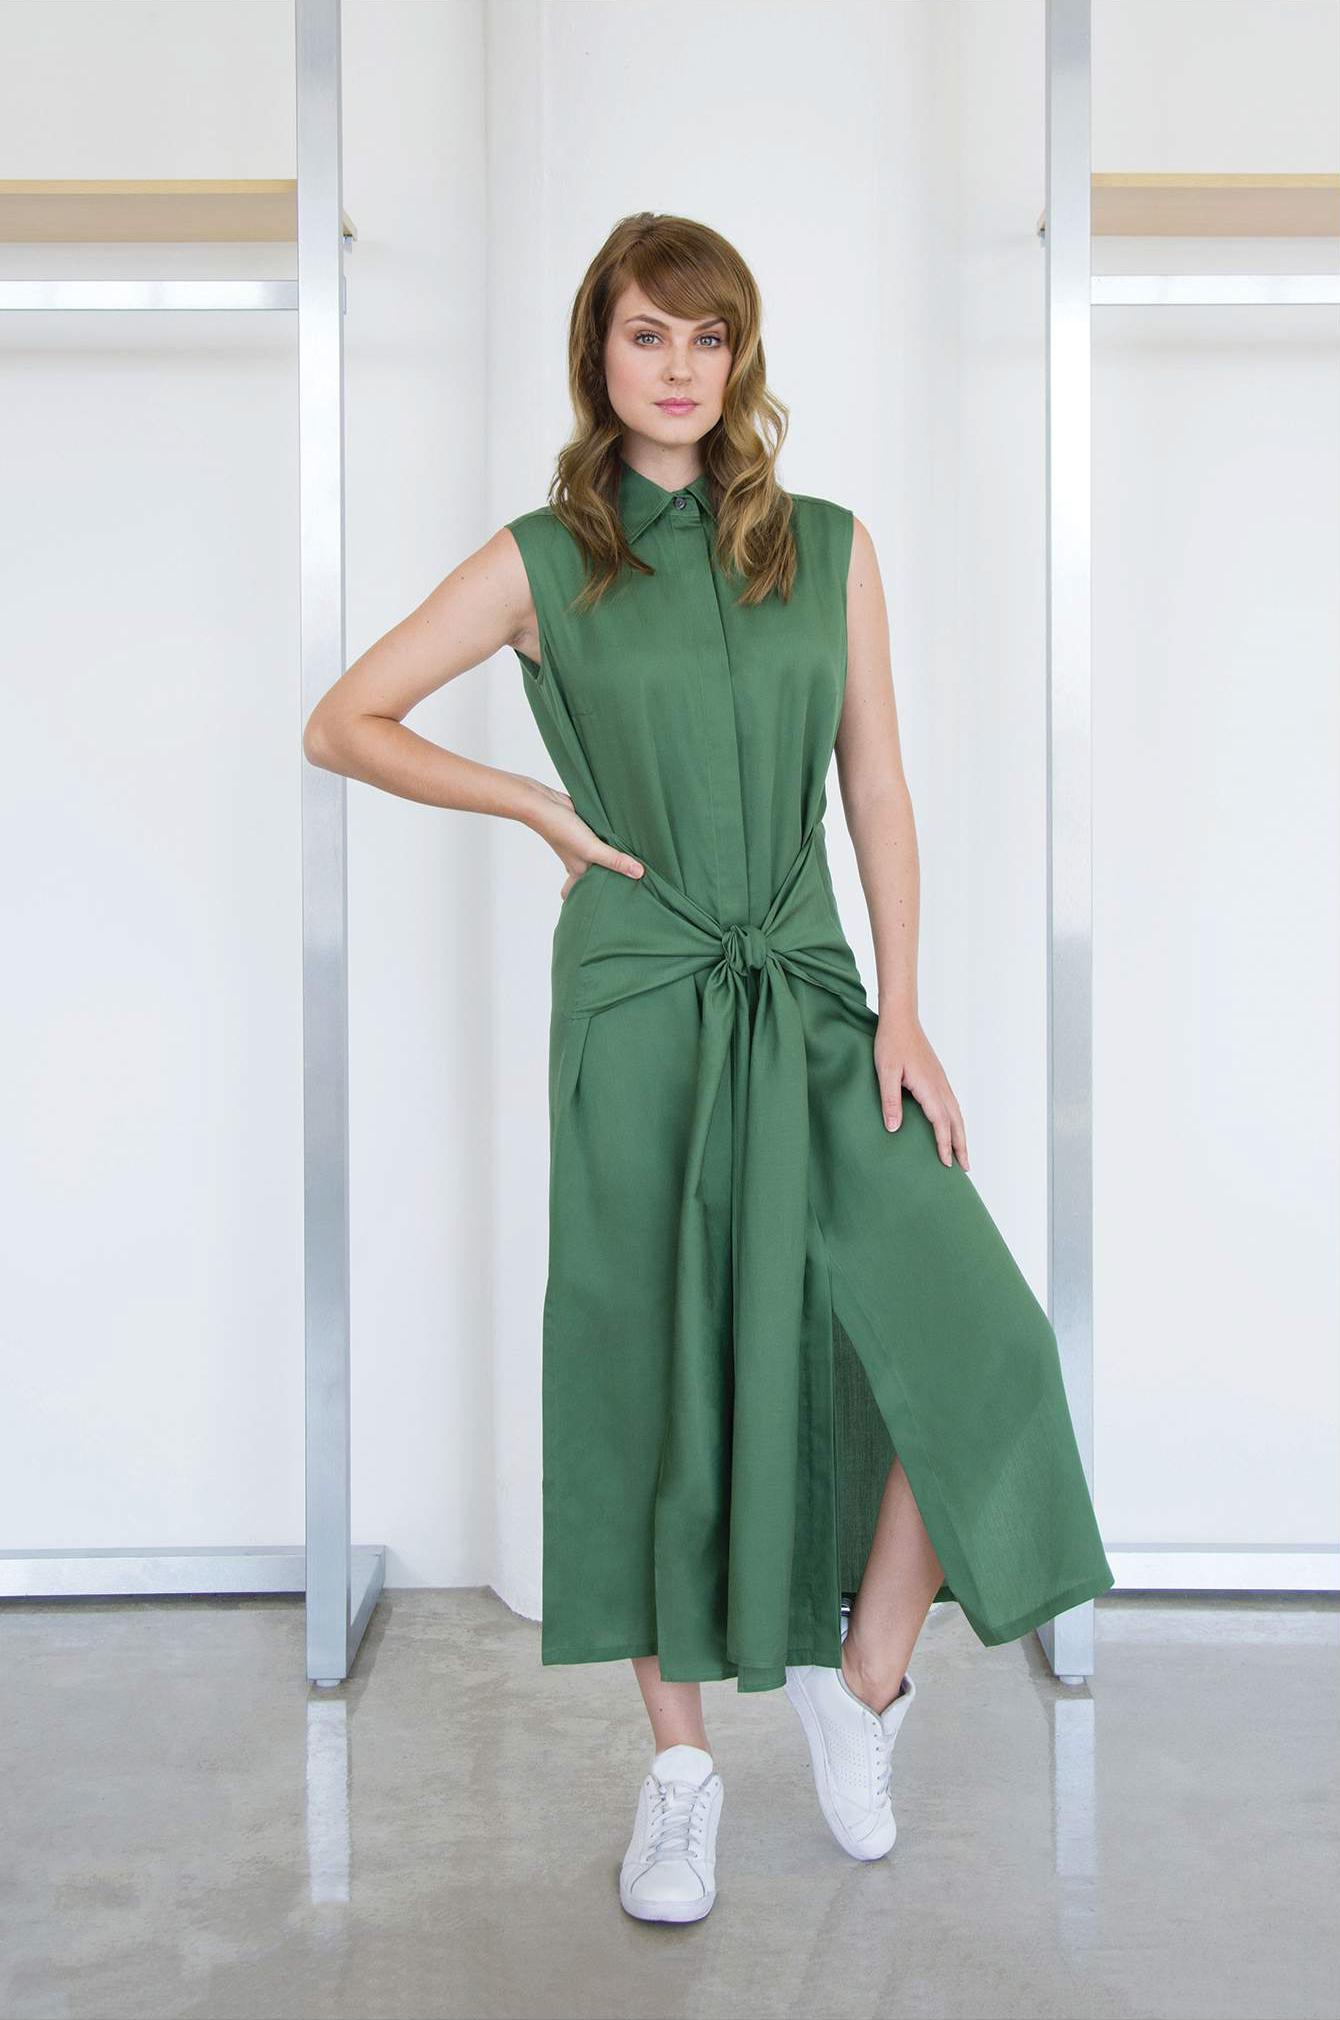 Dress: Patricia - SANTORELLI